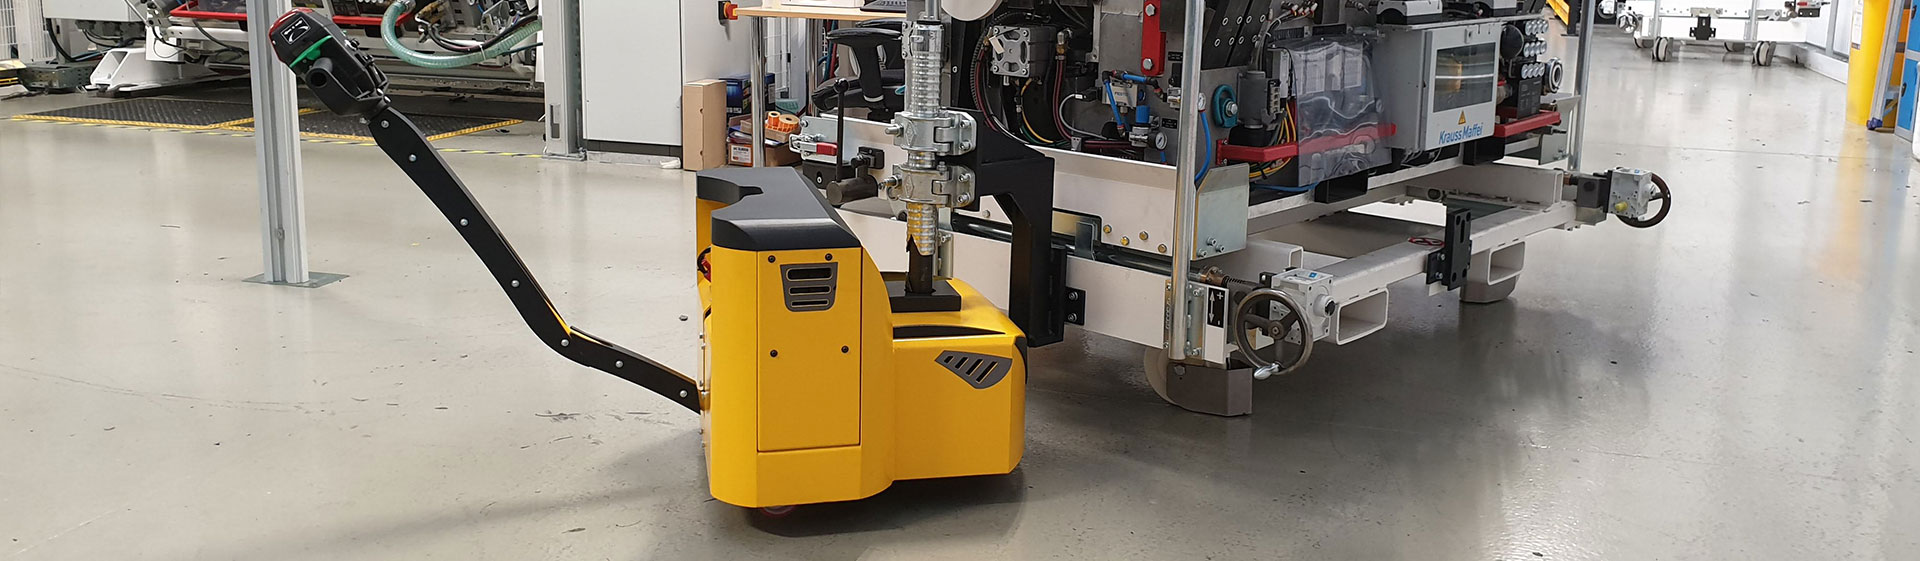 Electric Tow Tug MotorMover UK Manufacturer